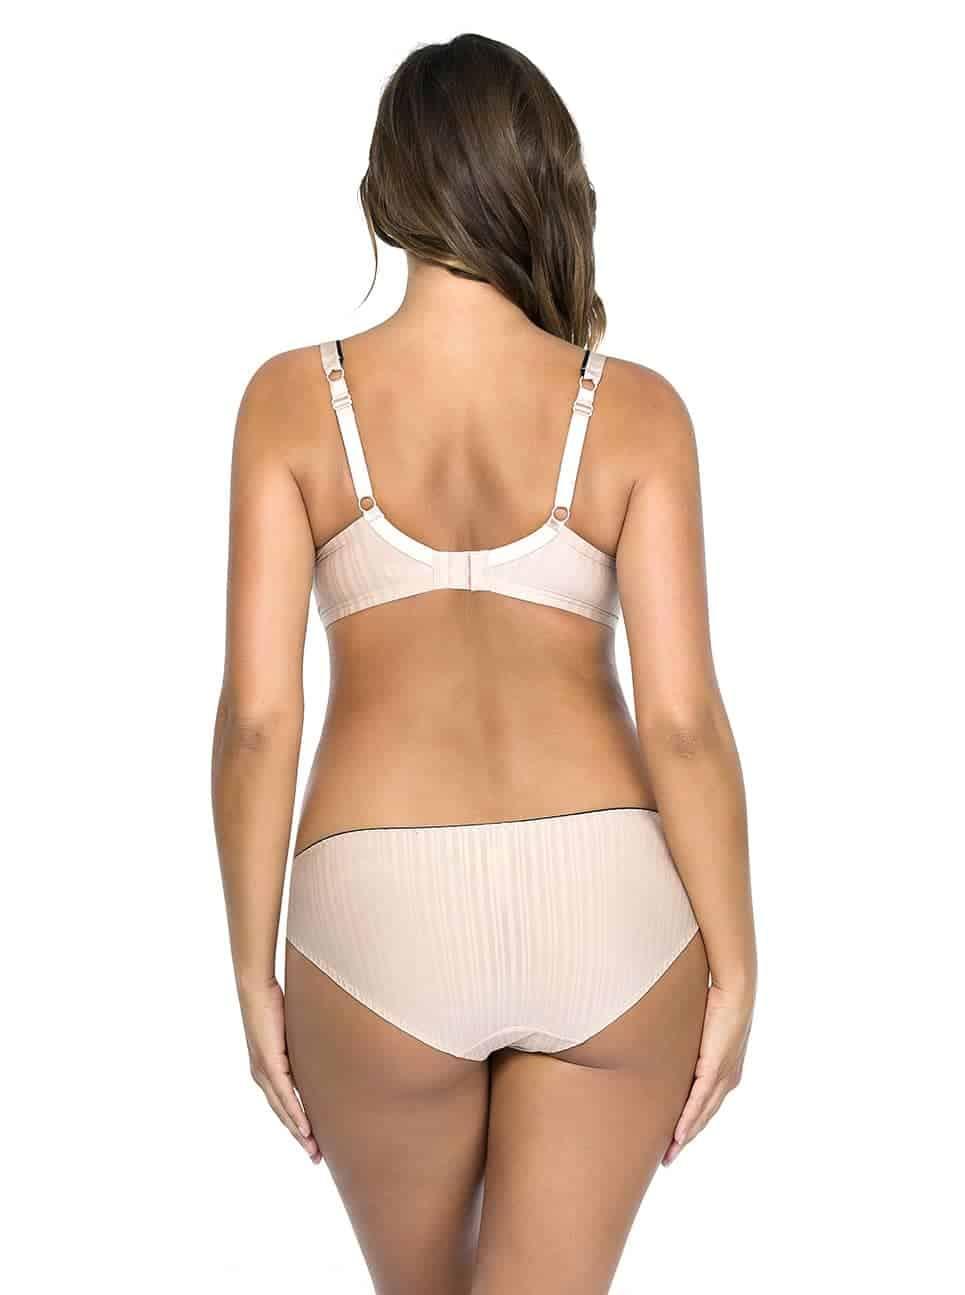 Aline TShirtBraP5251 BikiniP5253 Nude Back - Aline Bikini - Nude - P5253